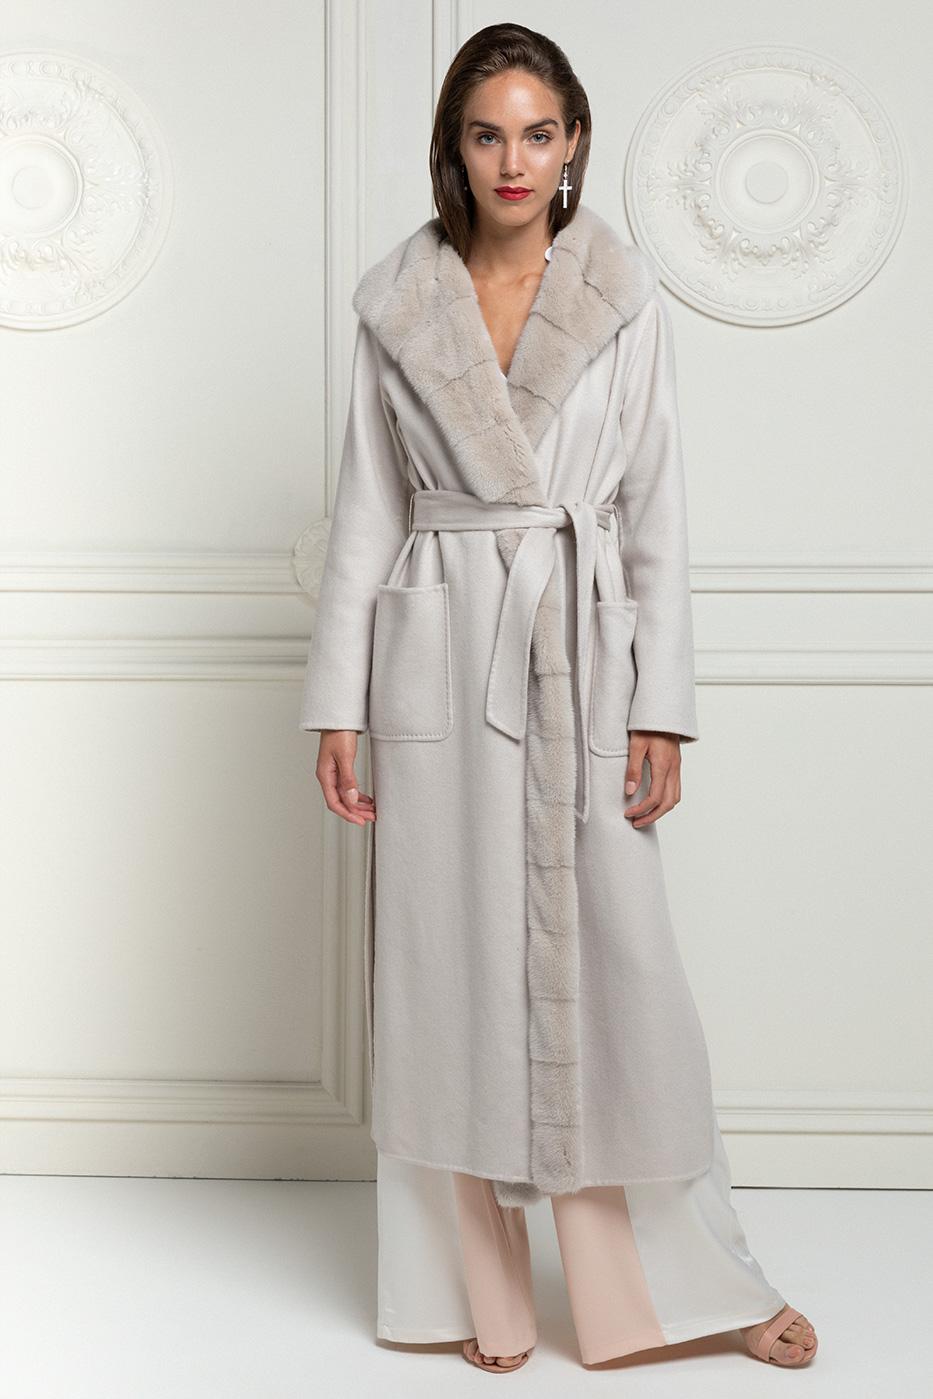 Cashmere Loro Piana Coat with Beige Mink